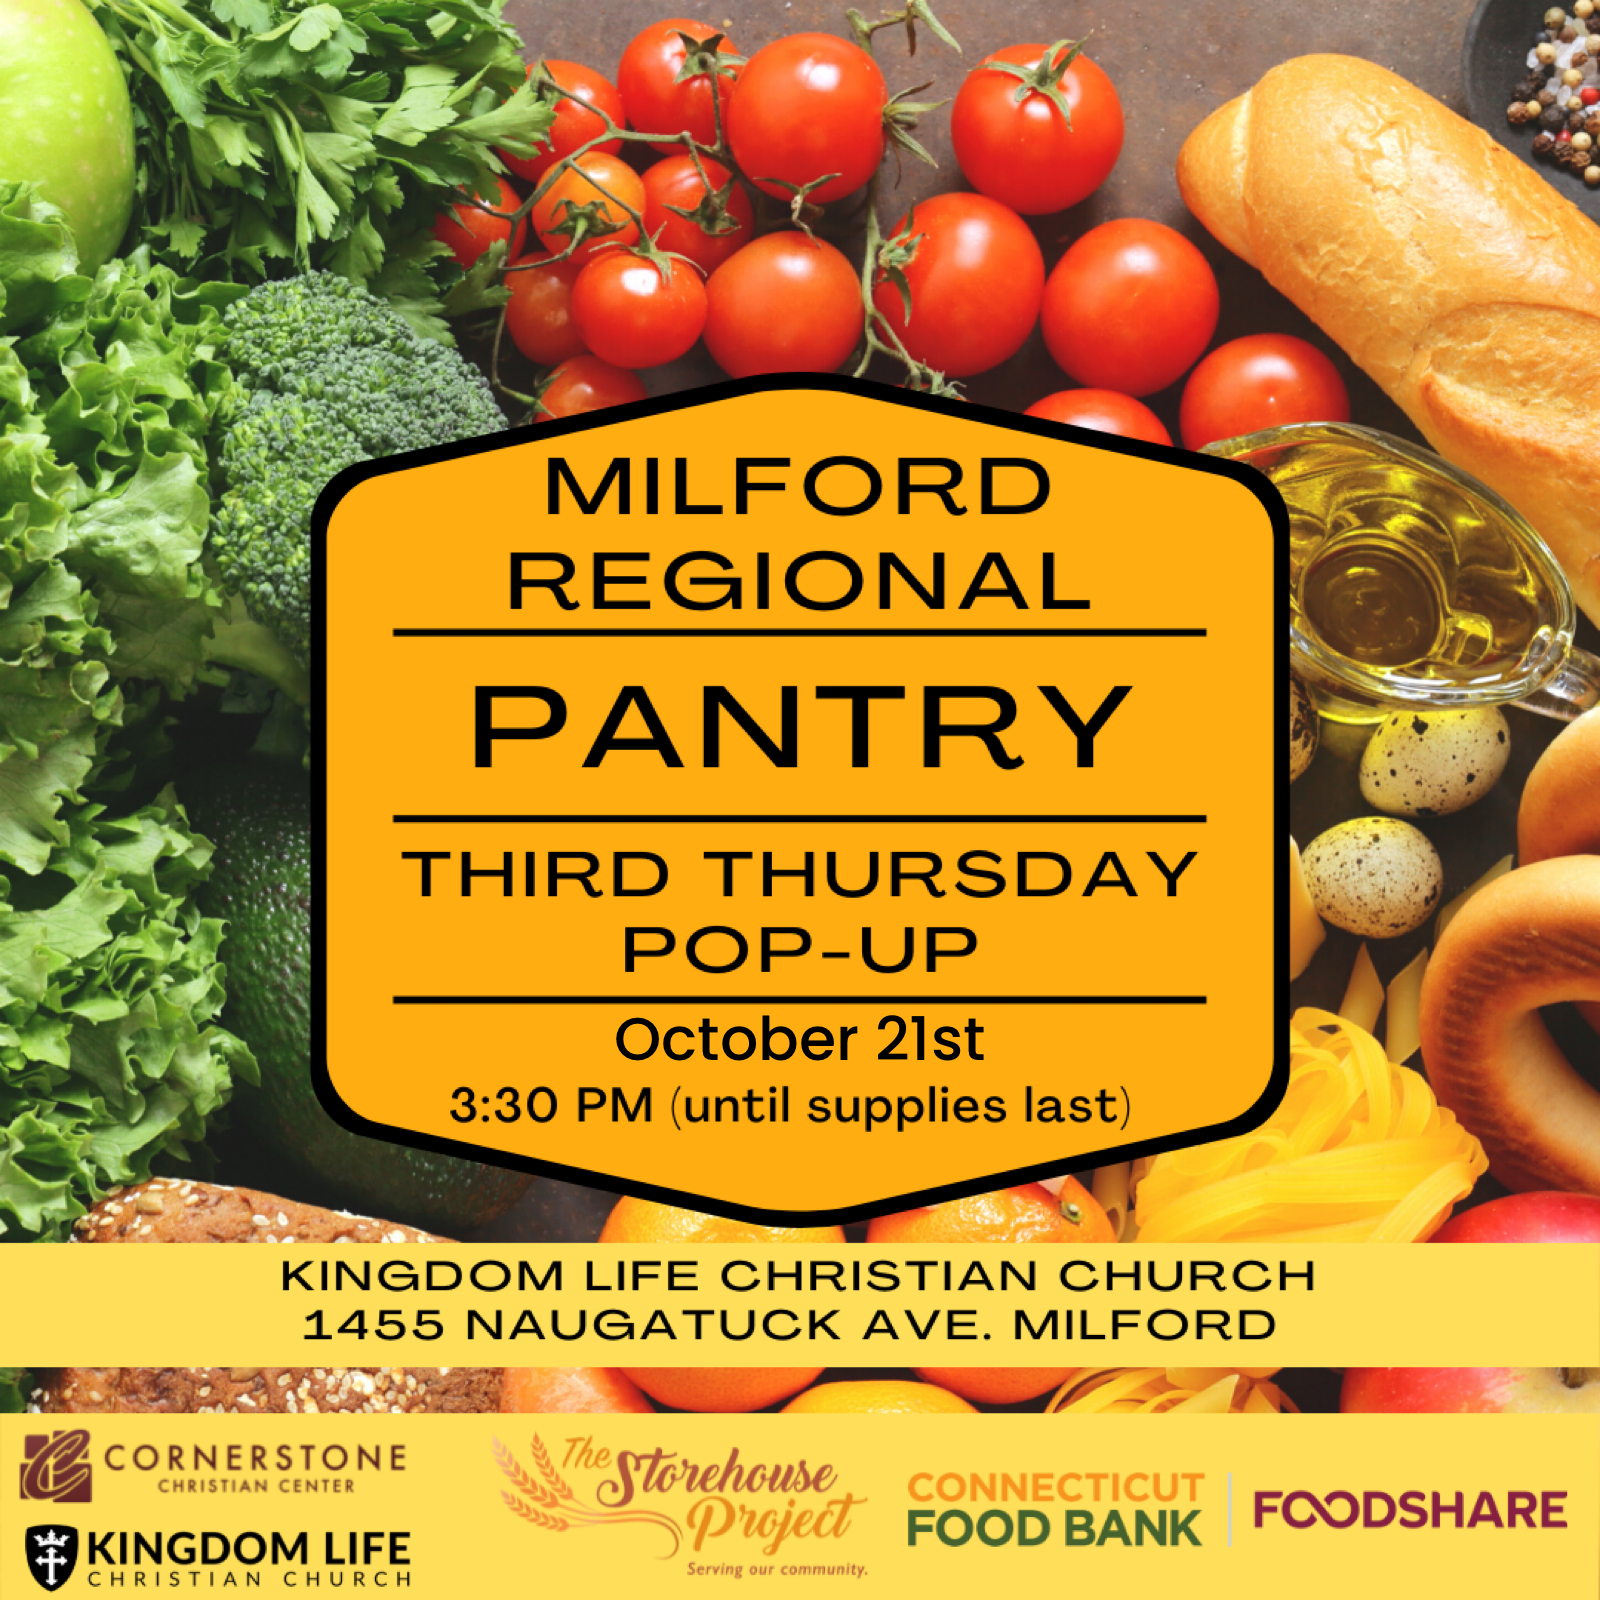 Milford Regional Pantry Third Thursday Pop Up October